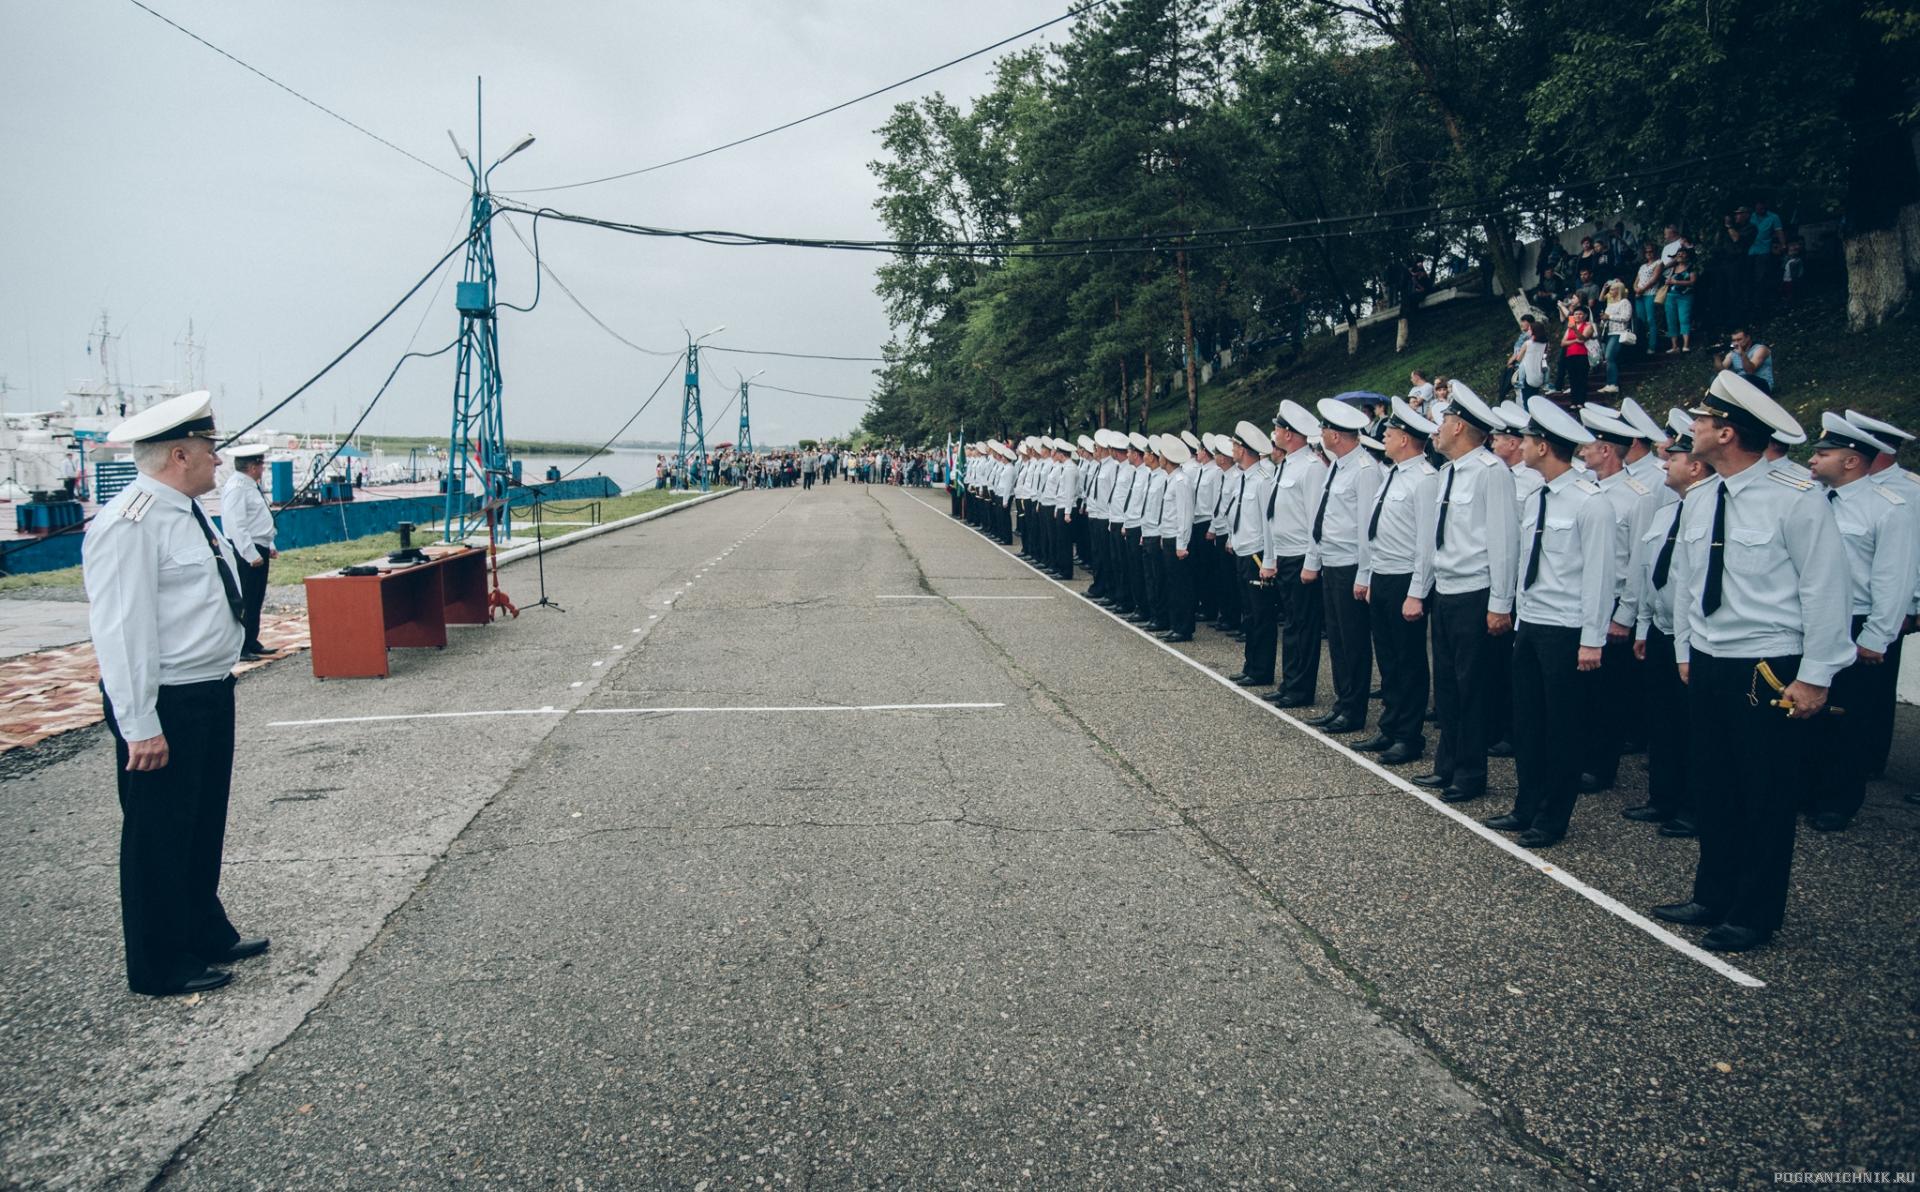 Комбриг капитан 1-го ранга Карасев и праздничная колонна 12 ОБСКК. 28.07. 2017 г.